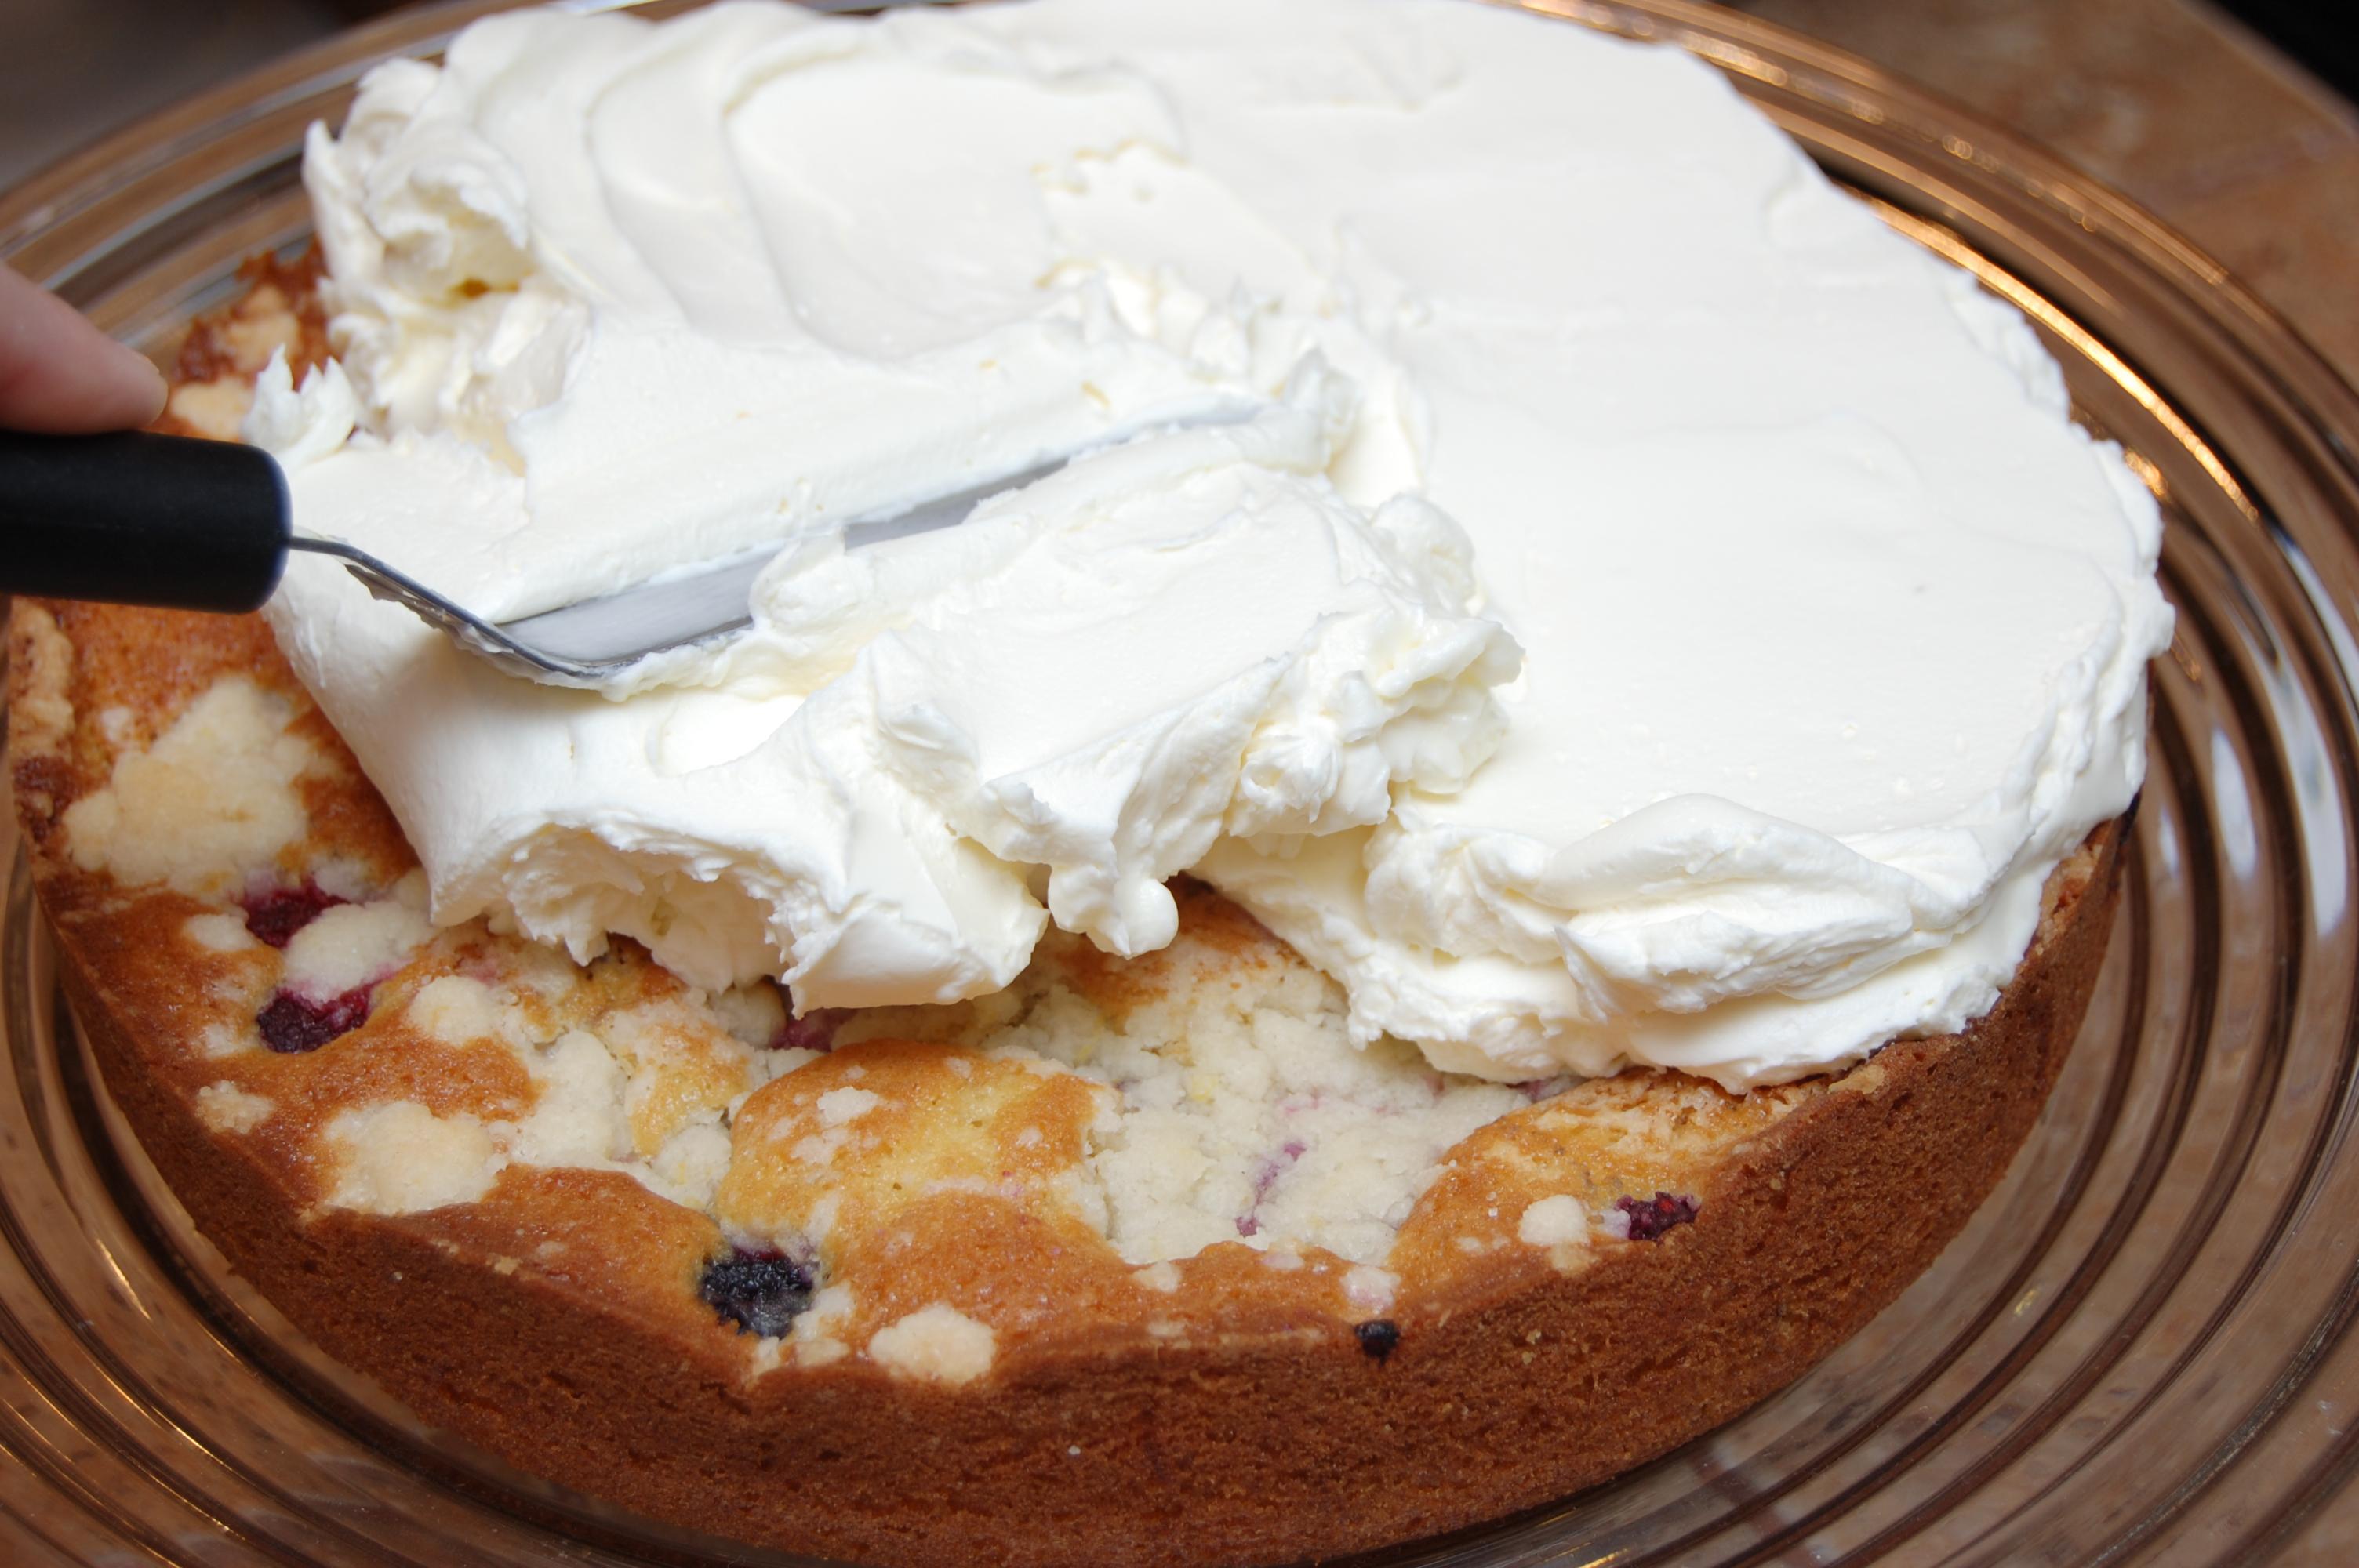 Торт с кремом из маскарпоне и сливок